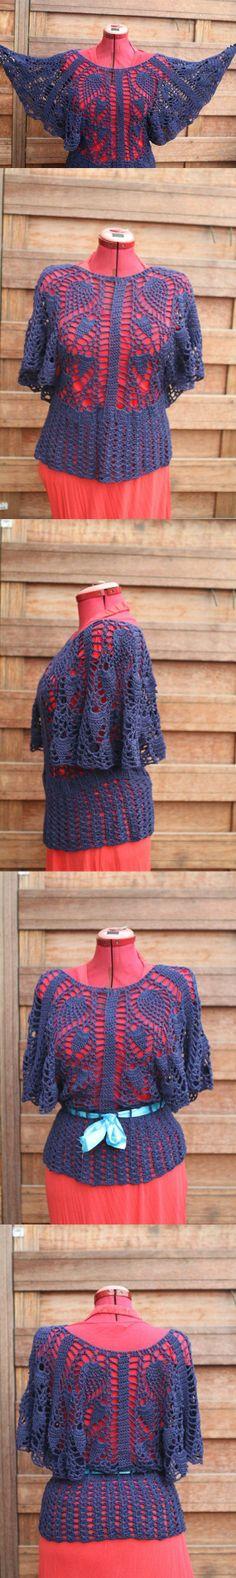 Crochet top,blue wide sleeved bamboo yarn, handmade size M / L : Blue lagoon. Crochet Cape, Crochet Shirt, Crochet Sweaters, Crochet Jacket, Crochet Cardigan, Knit Or Crochet, Easy Crochet, Crochet Clothes, Crochet Woman